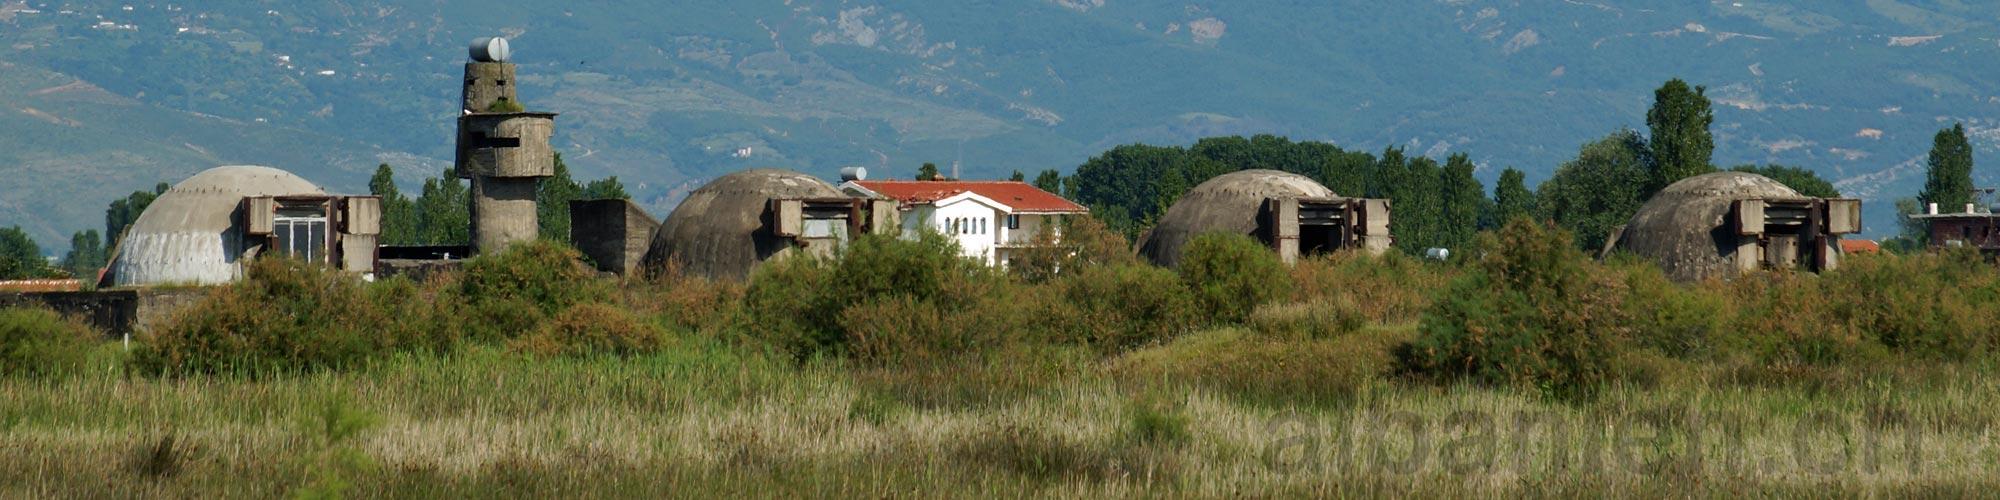 Tale Bunker Panorama